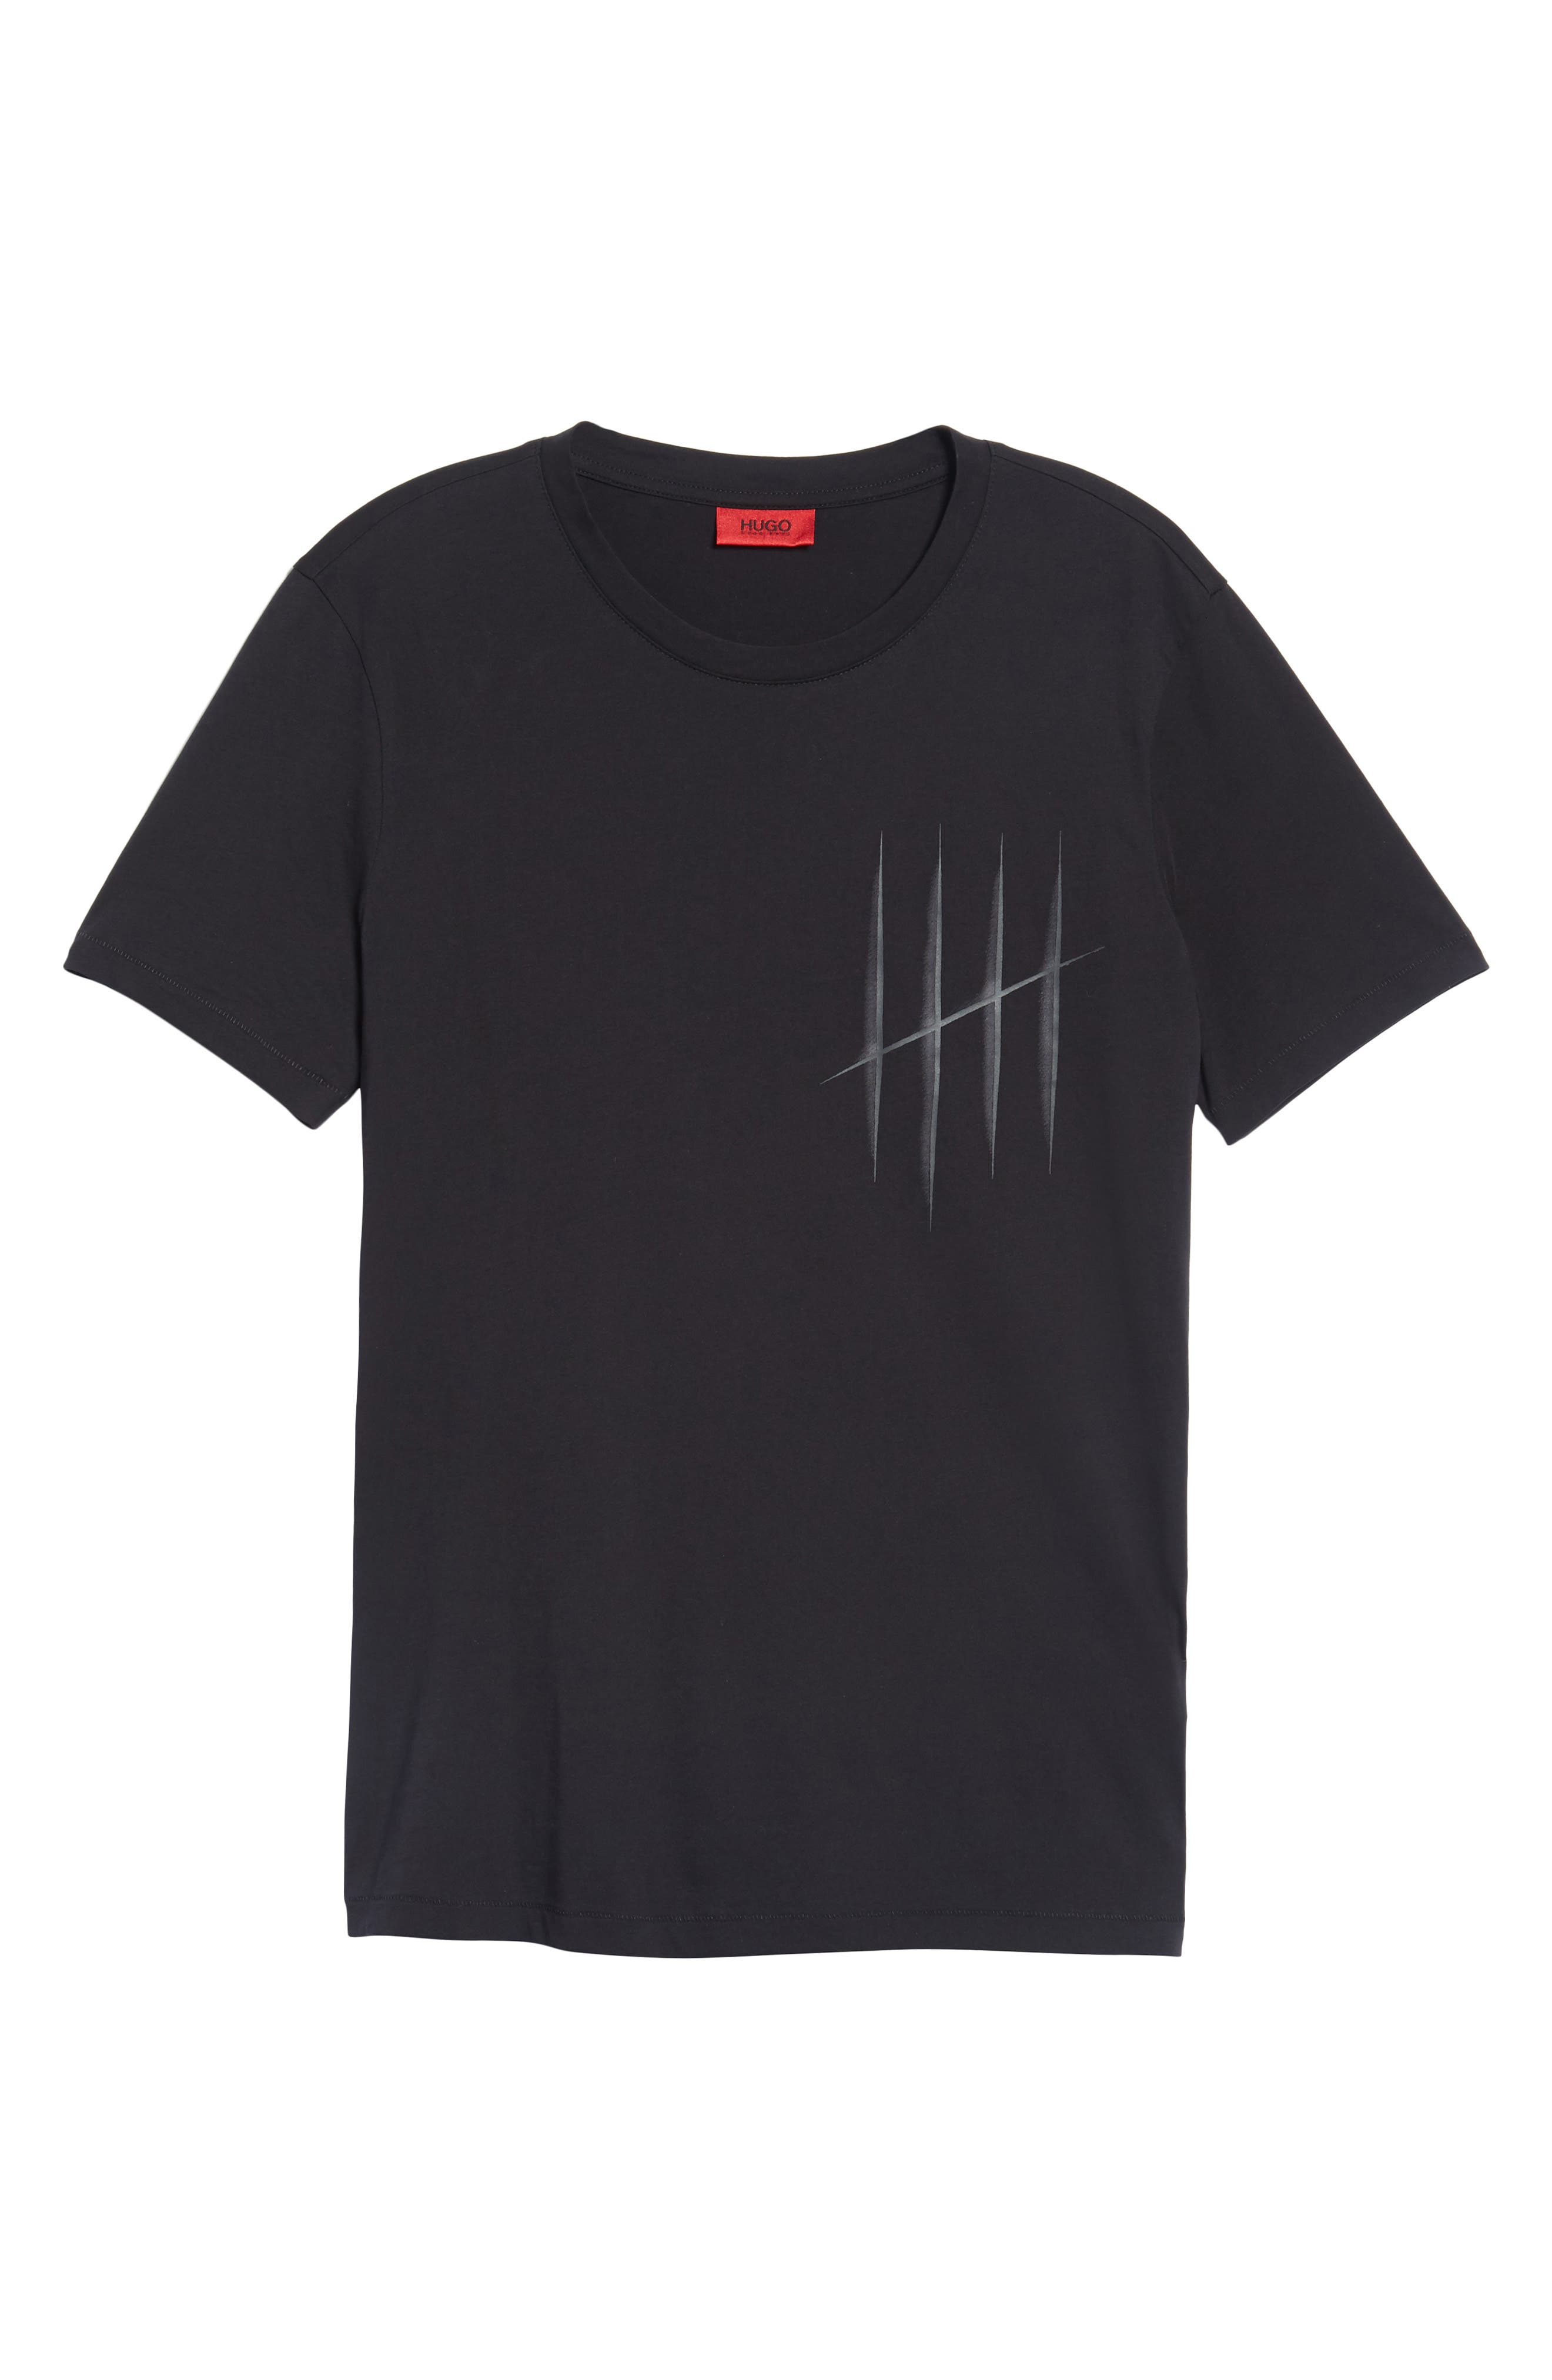 Hugo Boss Drison Hashmark Graphic T-Shirt,                             Alternate thumbnail 6, color,                             001